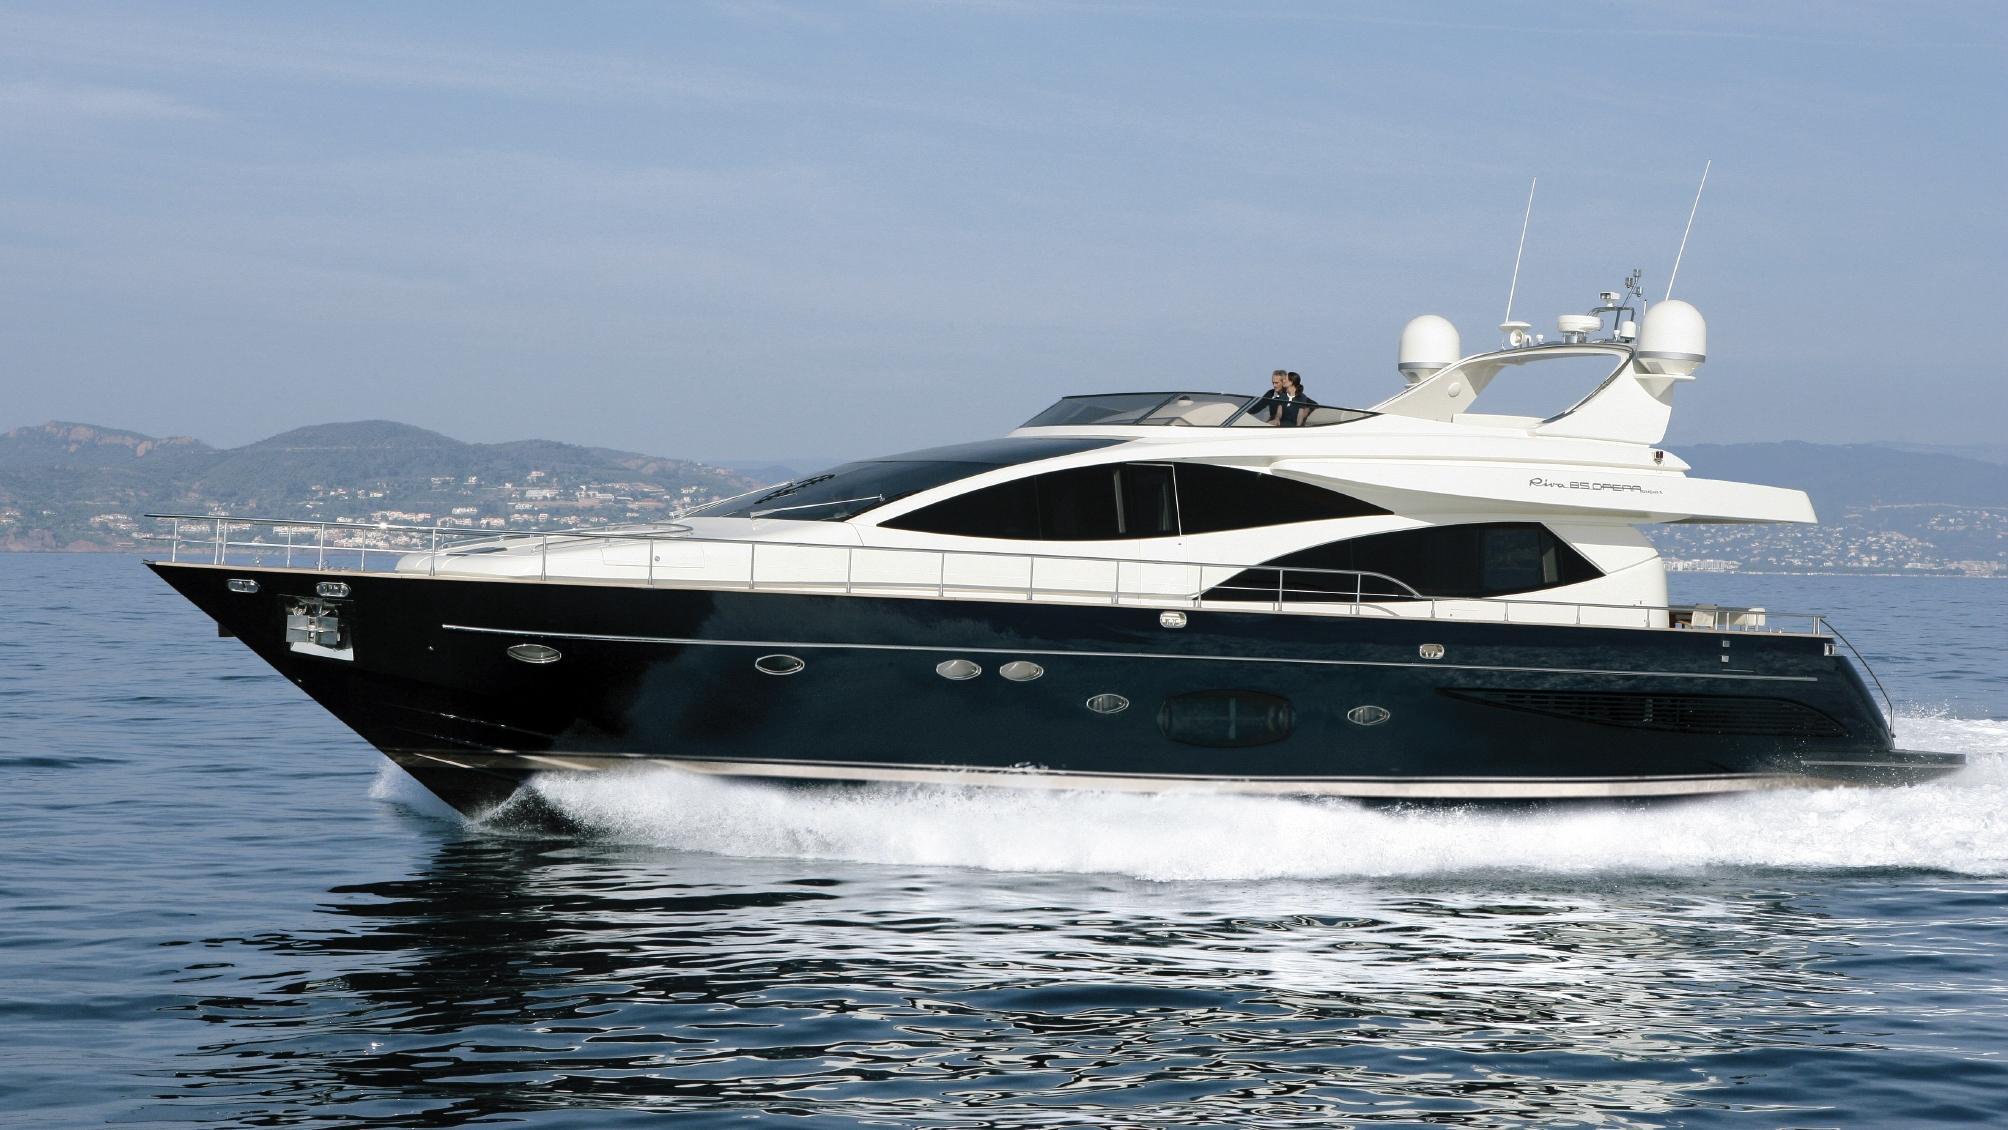 4-five-motor-yacht-riva-85-opera-2005-26m-cruising